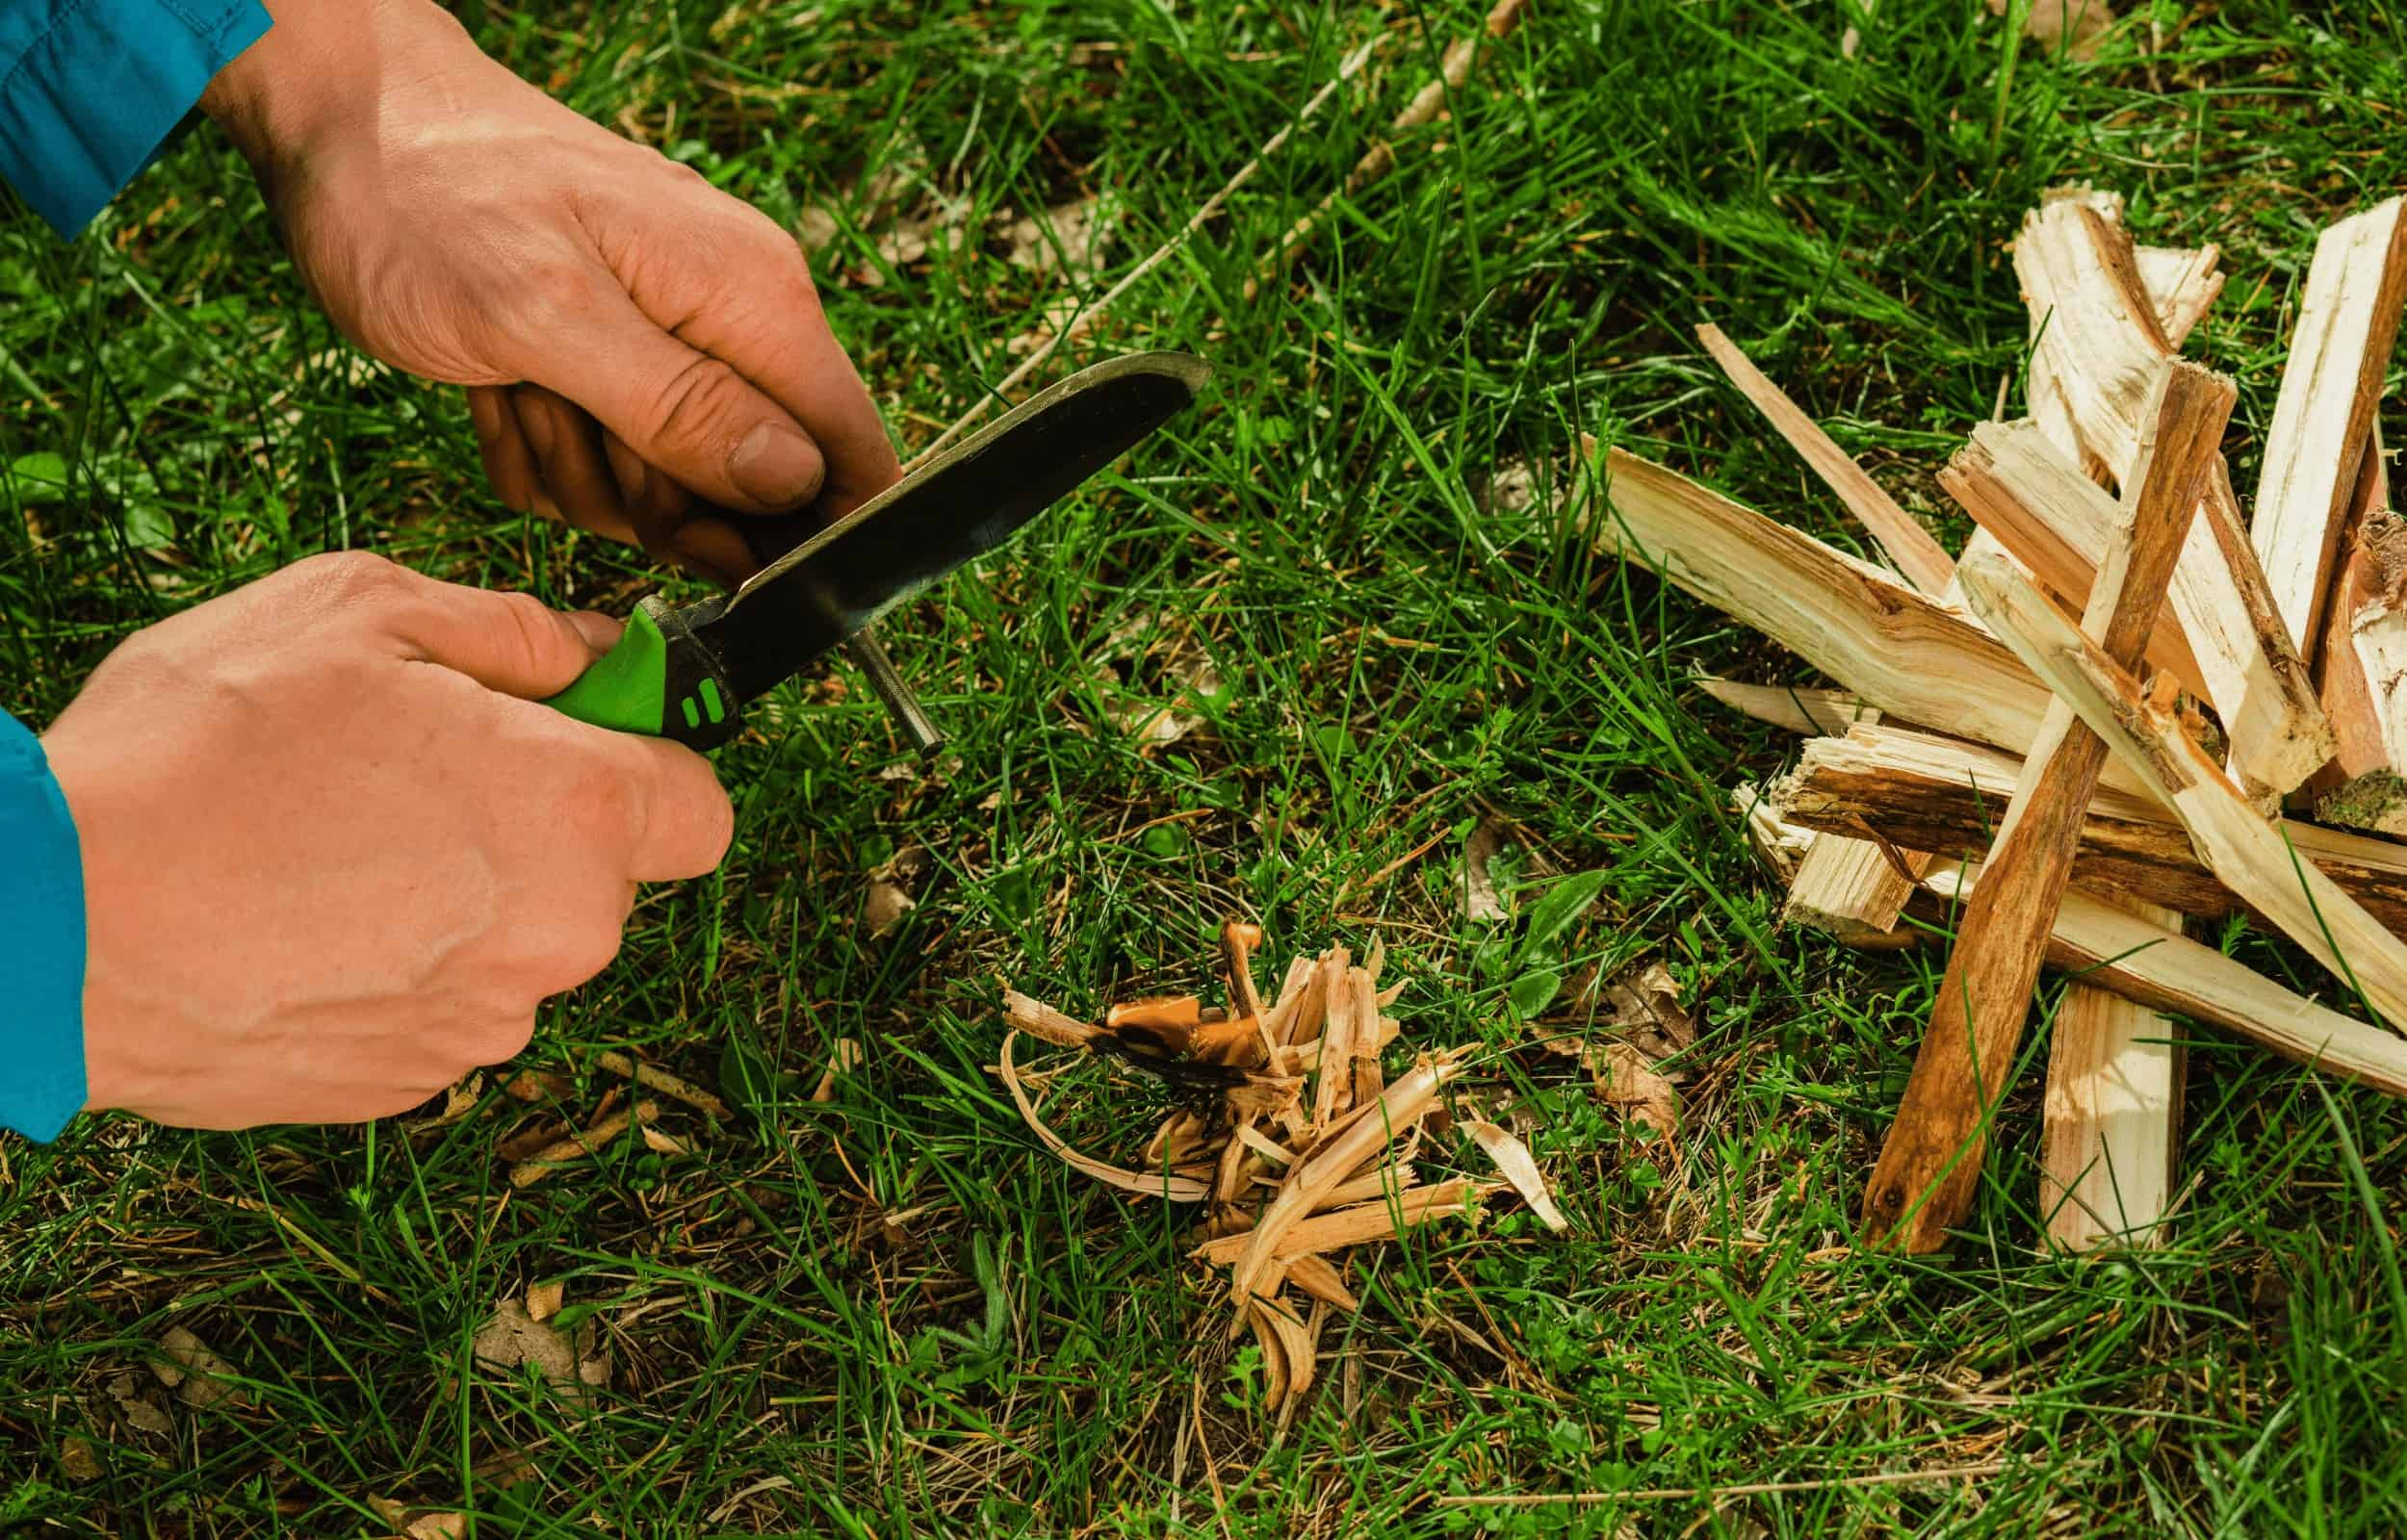 cutting firewood camping knife